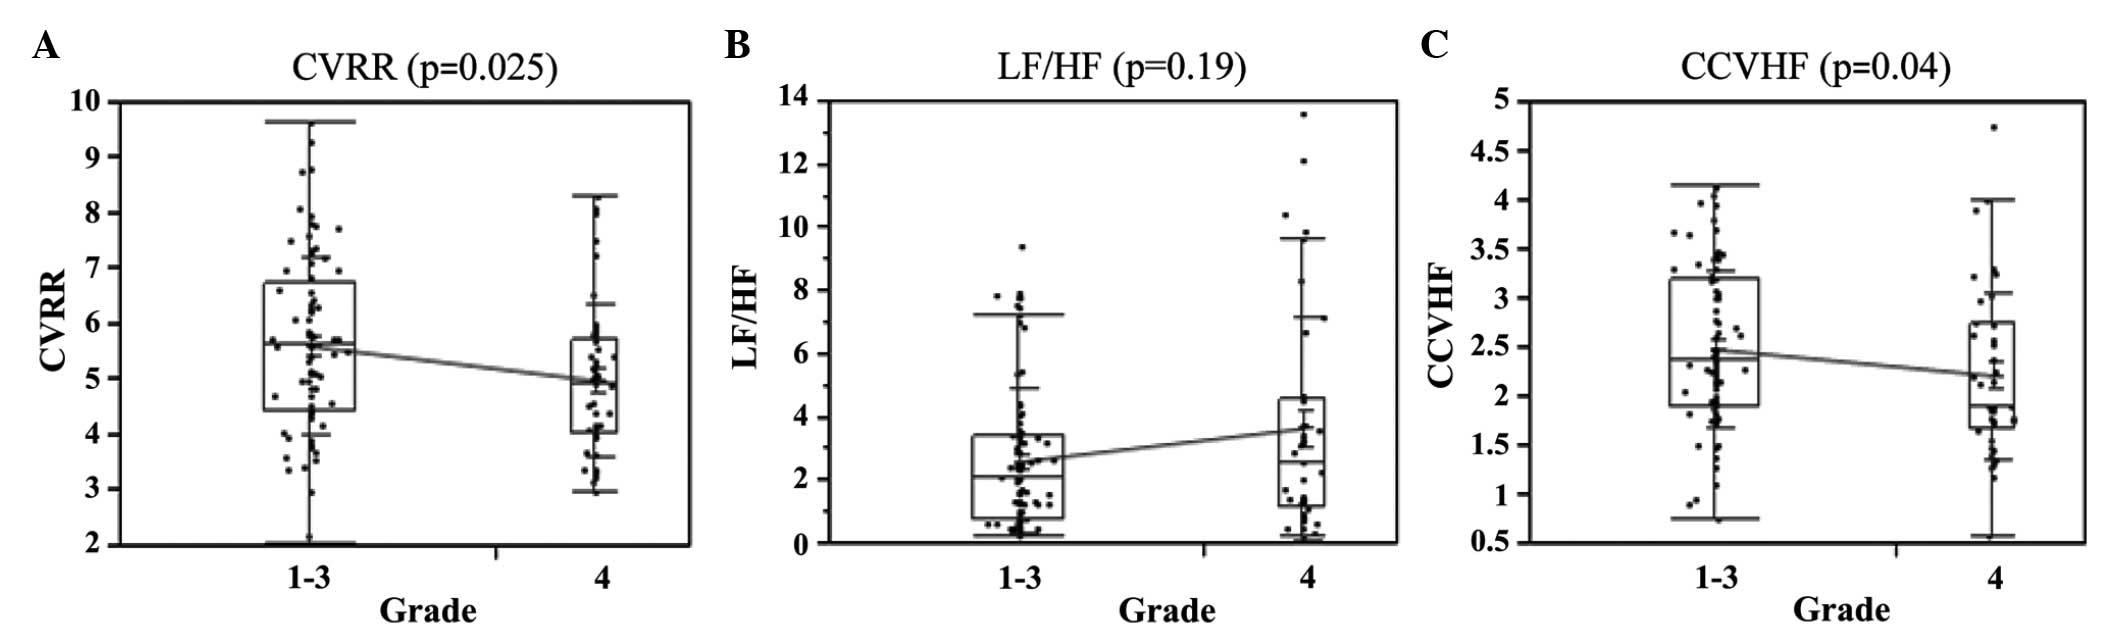 Assessment Of Autonomic Nervous System Function In Nursing Students